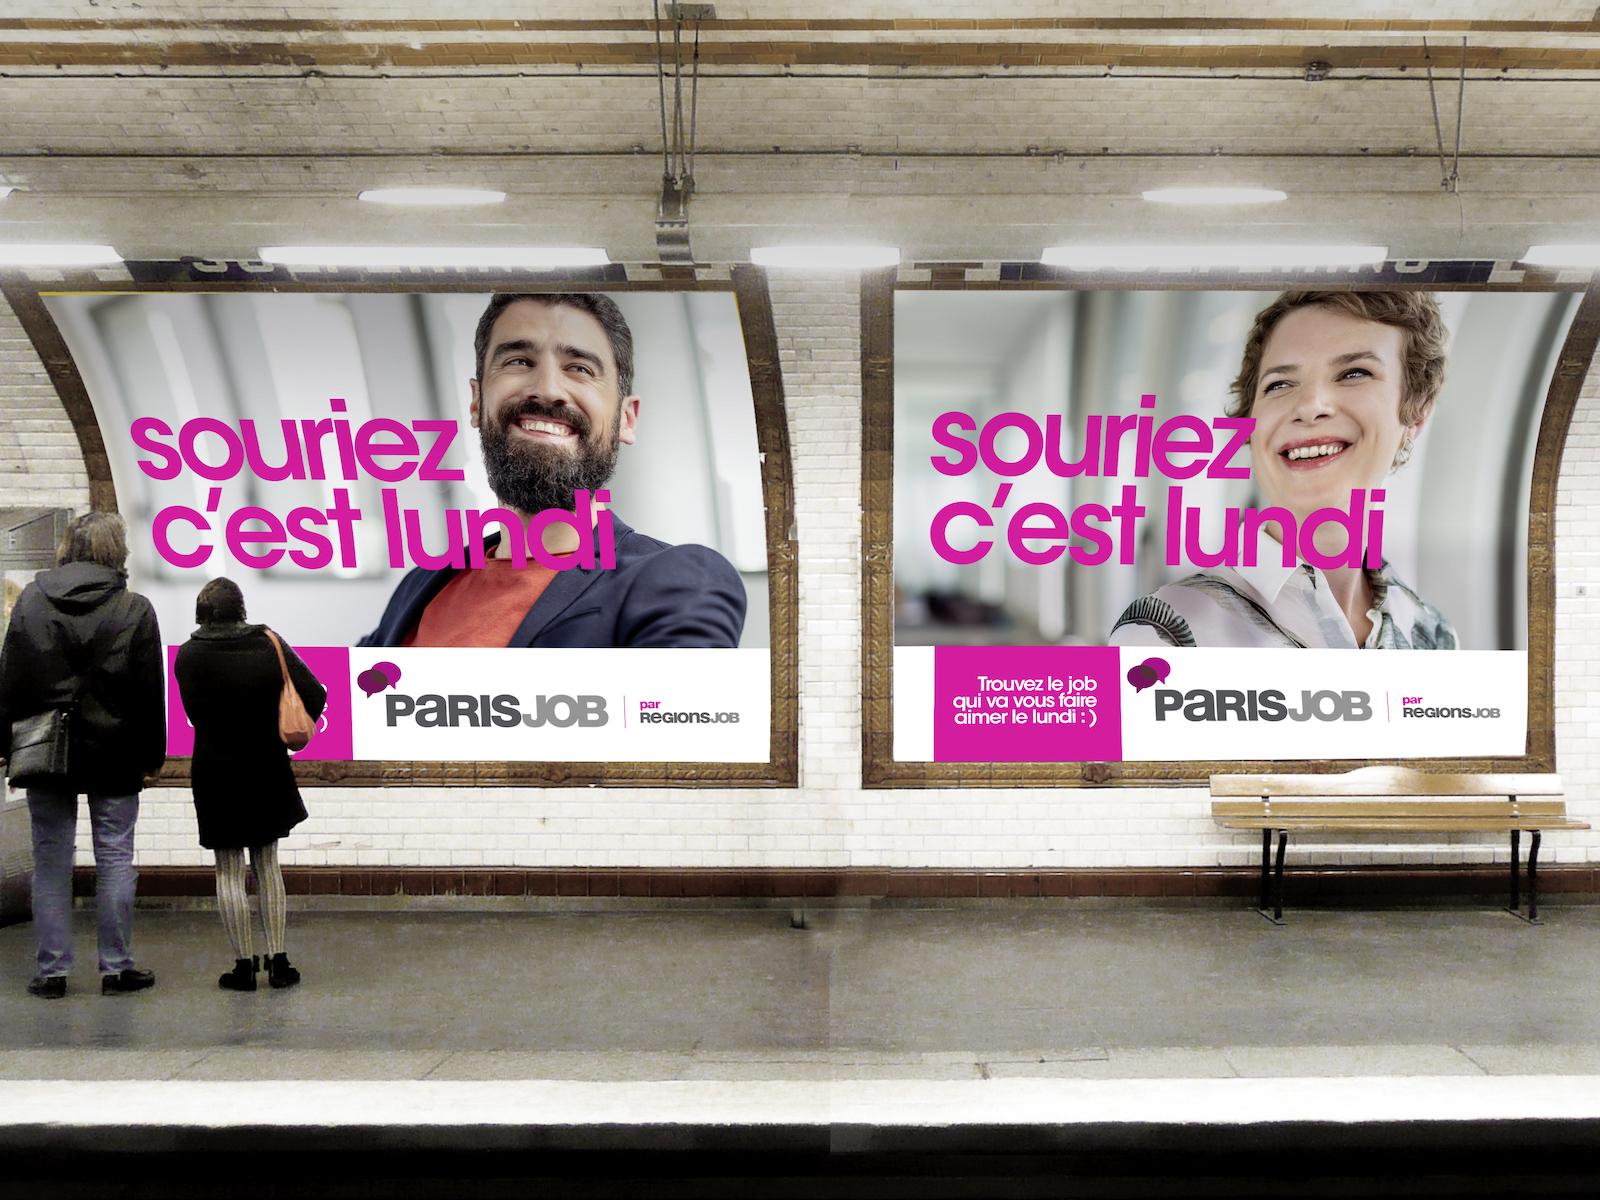 Regionsjob Notchup campagne affichage digital Souriez c'est lundi recrutement